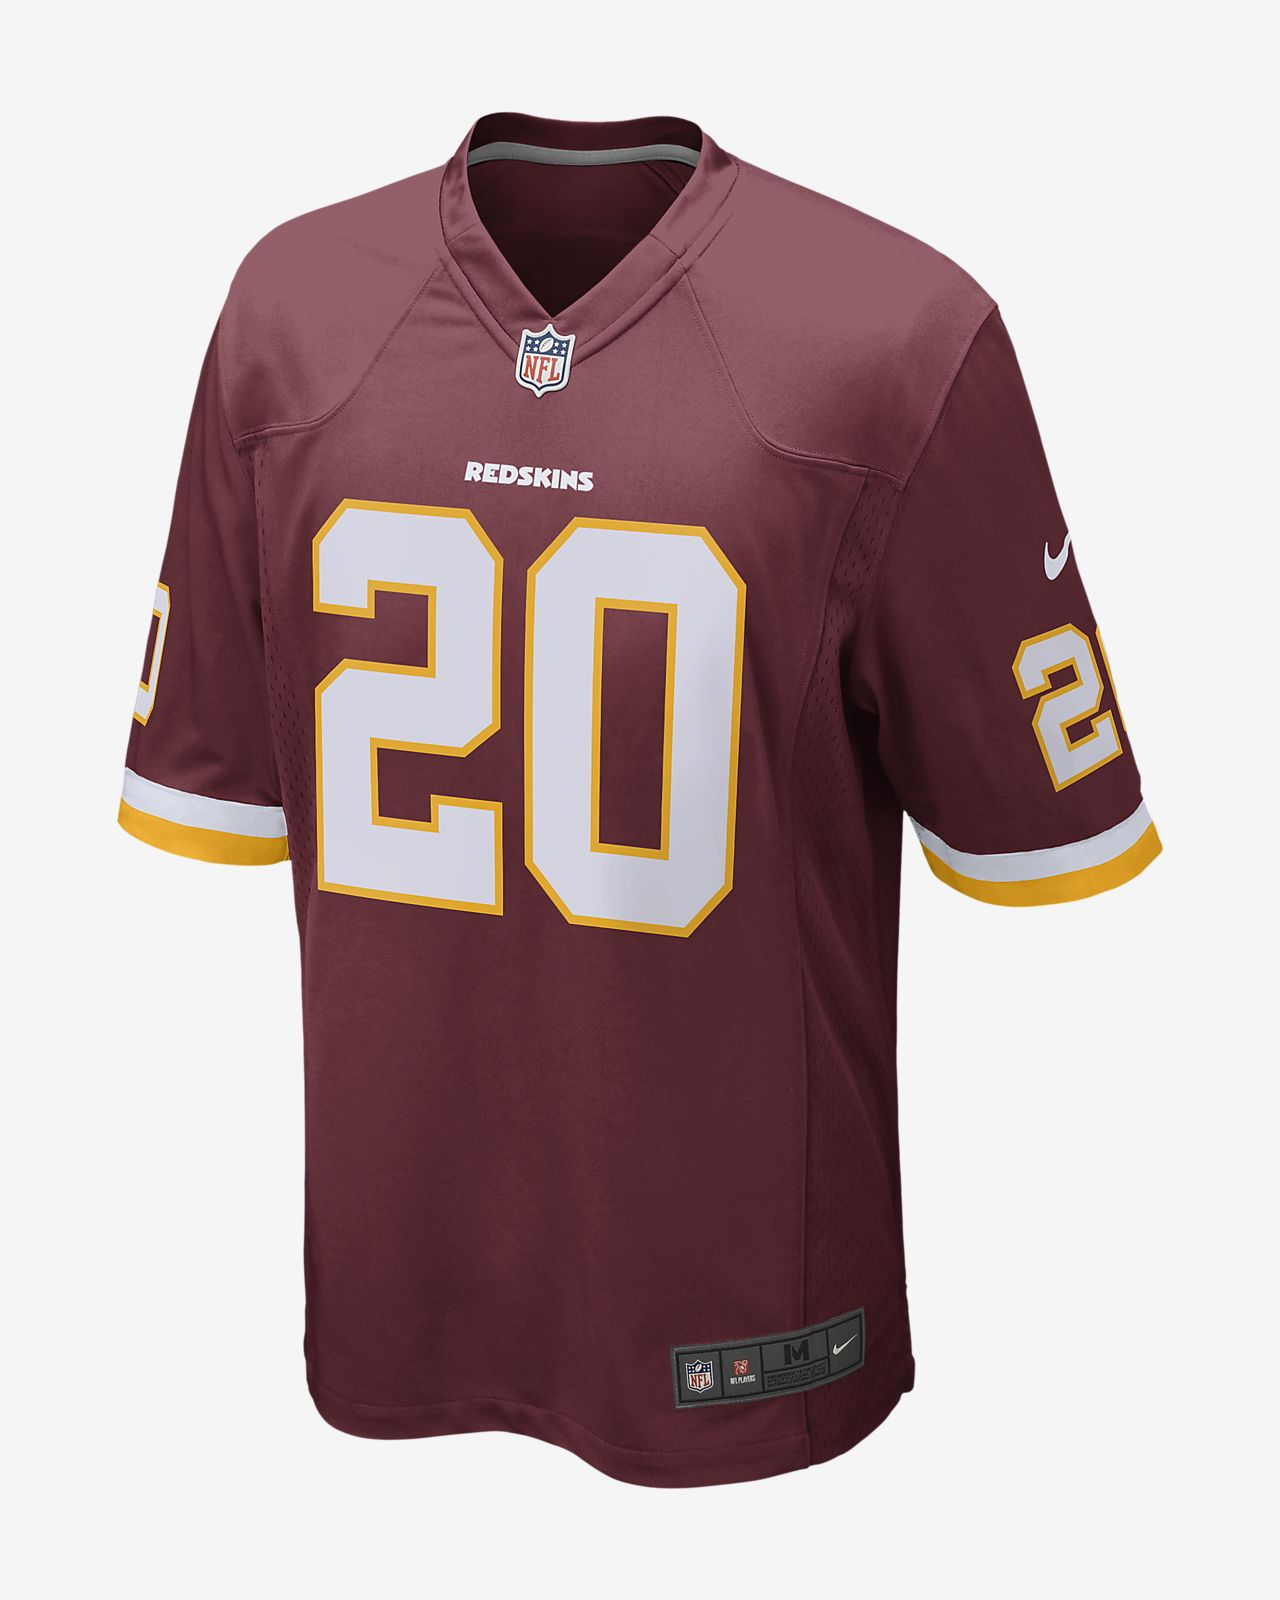 official photos 5ecde 9b785 NFL Washington Redskins (Landon Collins) Men's Game Football Jersey